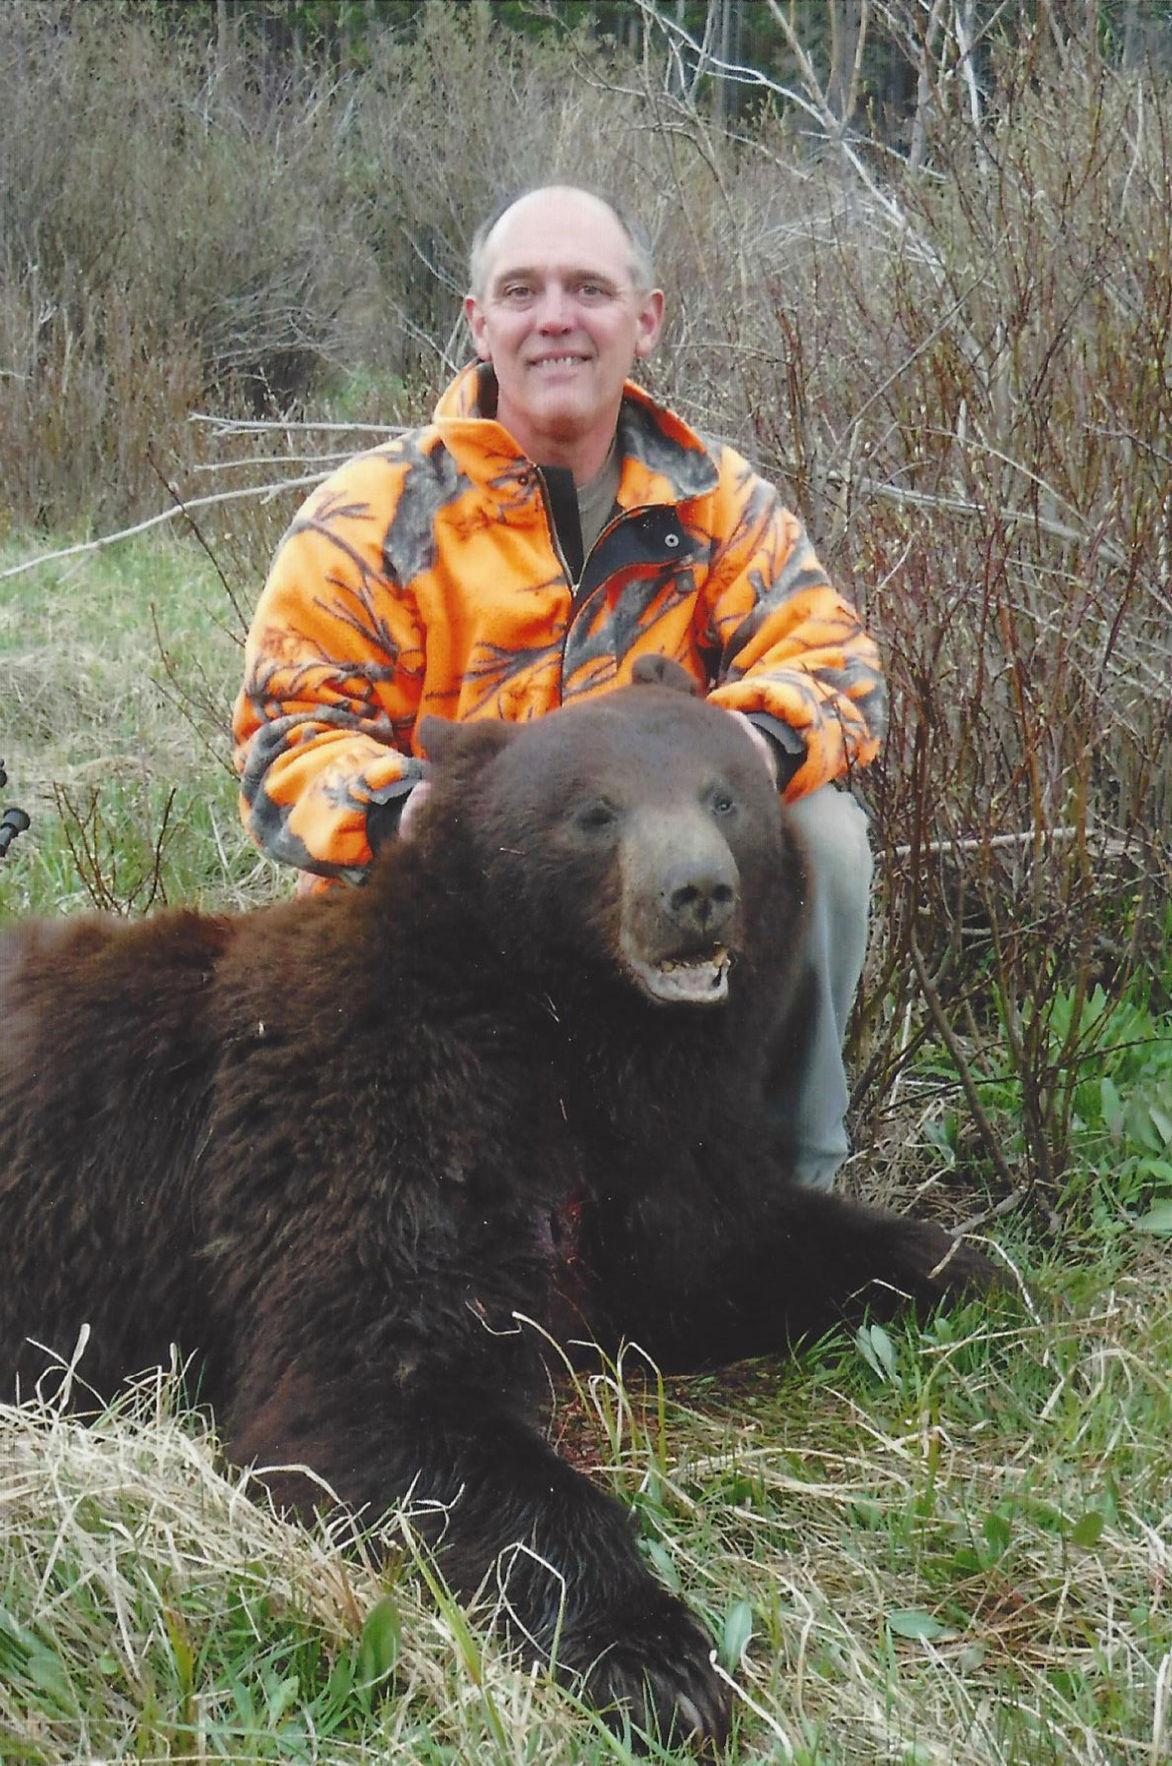 061516-bcp-bearhunt1